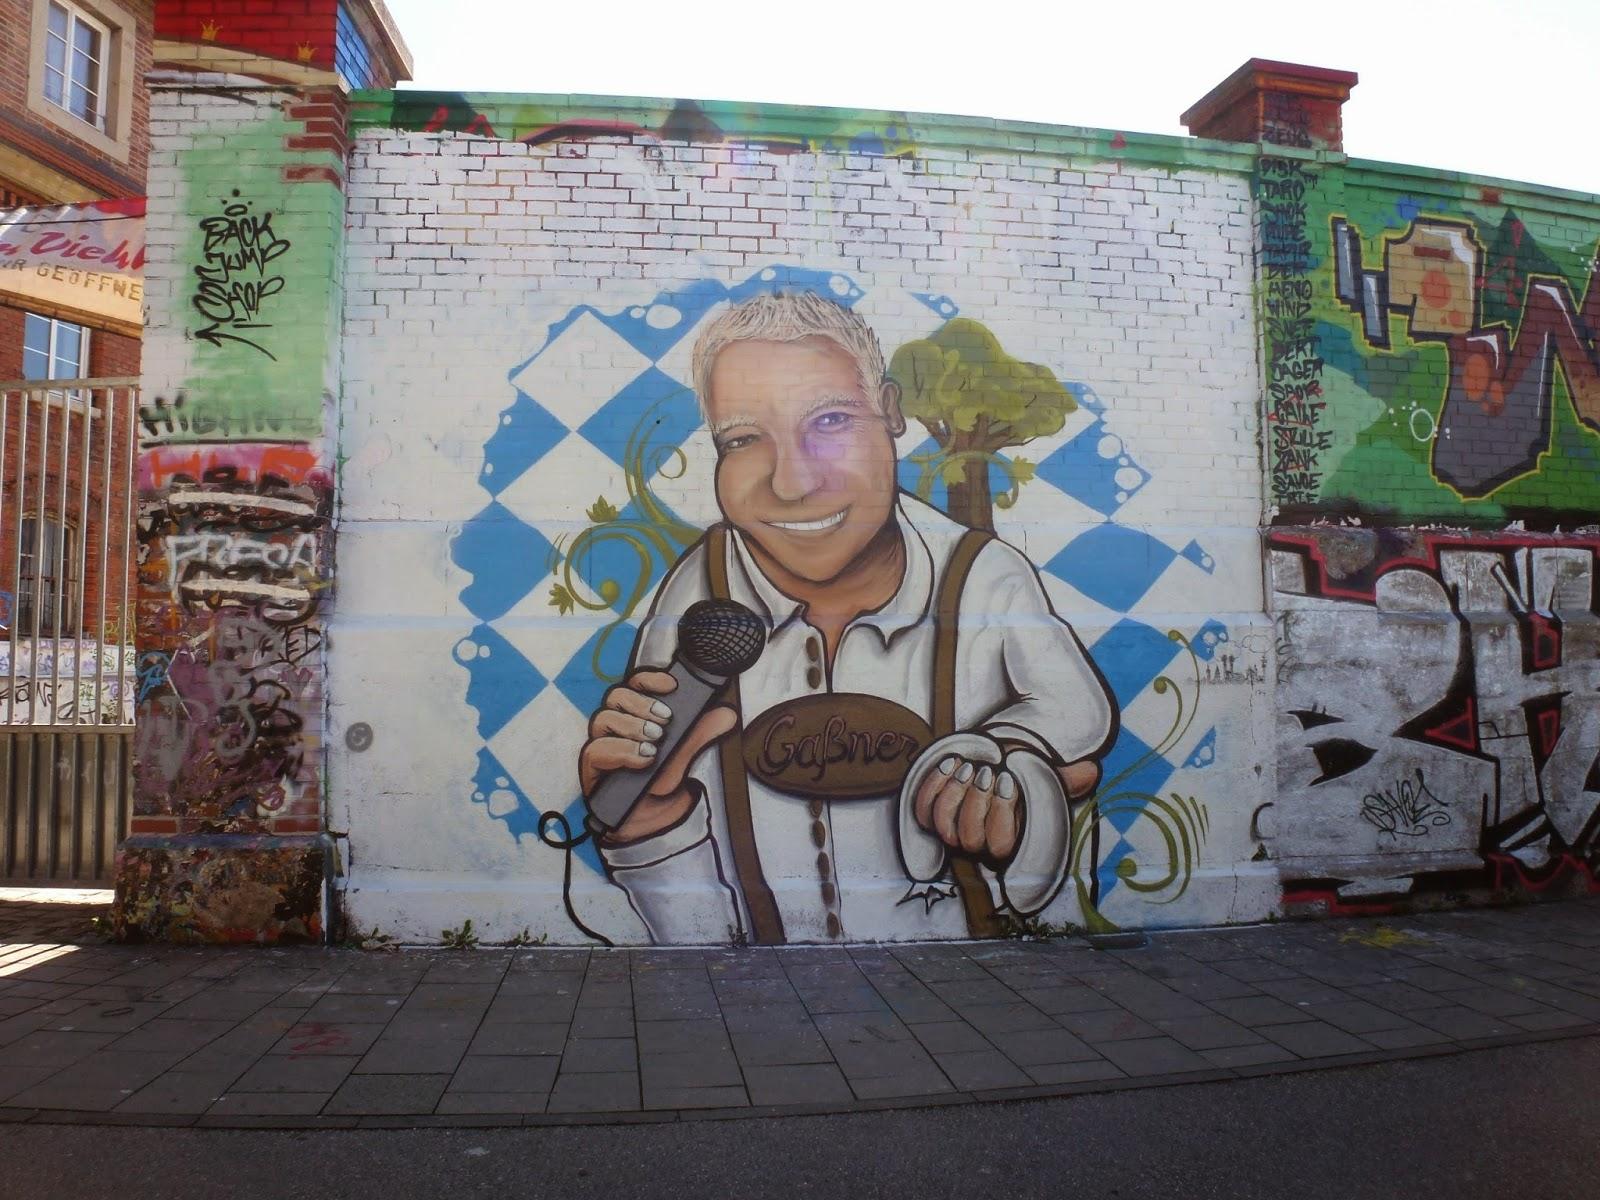 Graffiti, Streetart, Tumblingerstraße